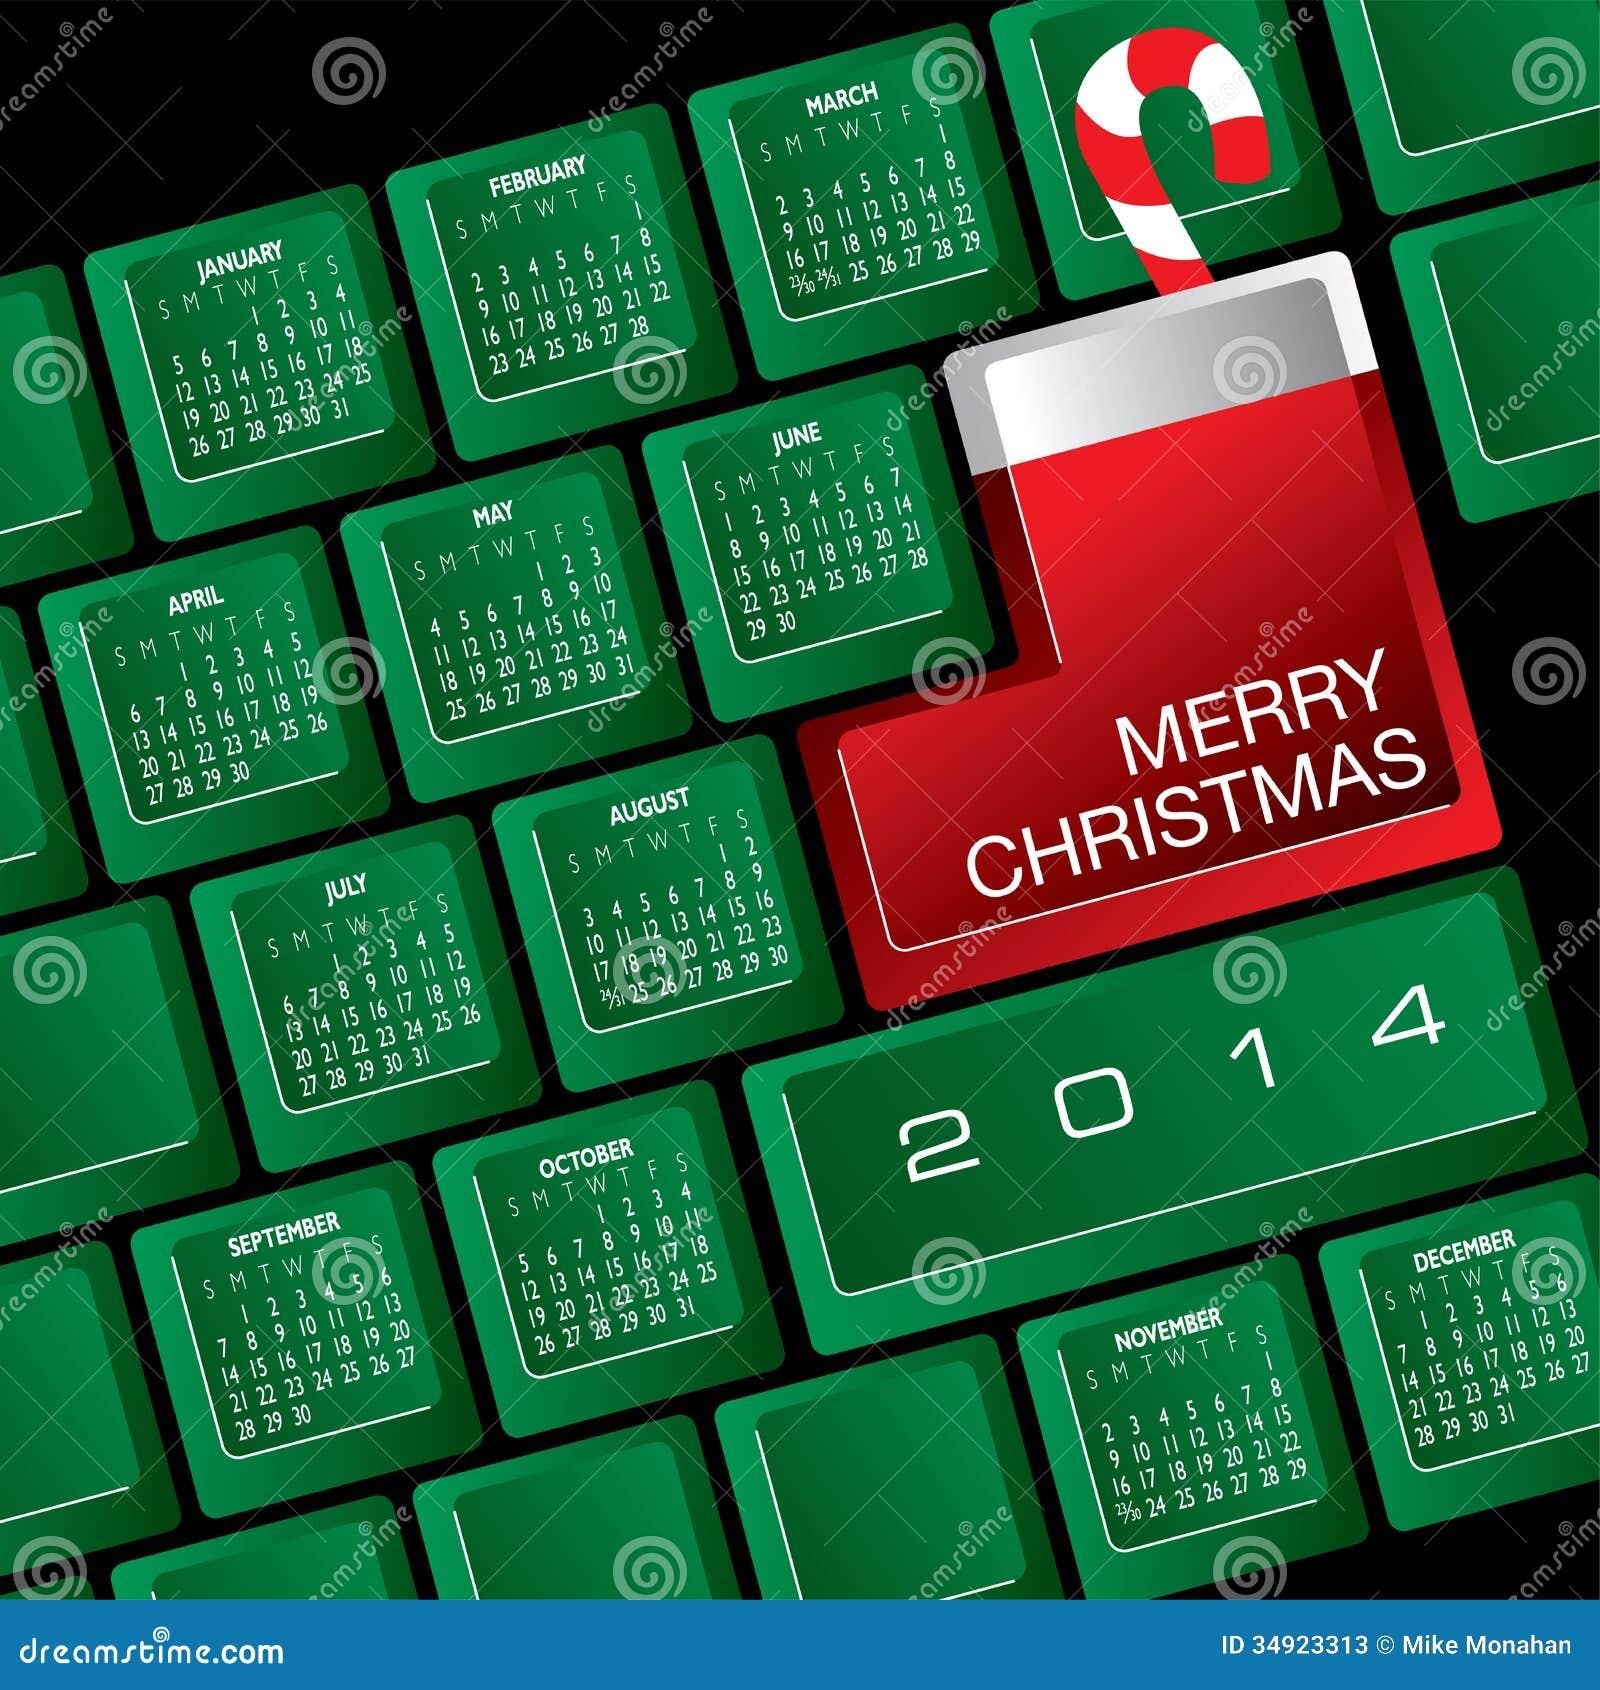 Christmas Candy Calendar